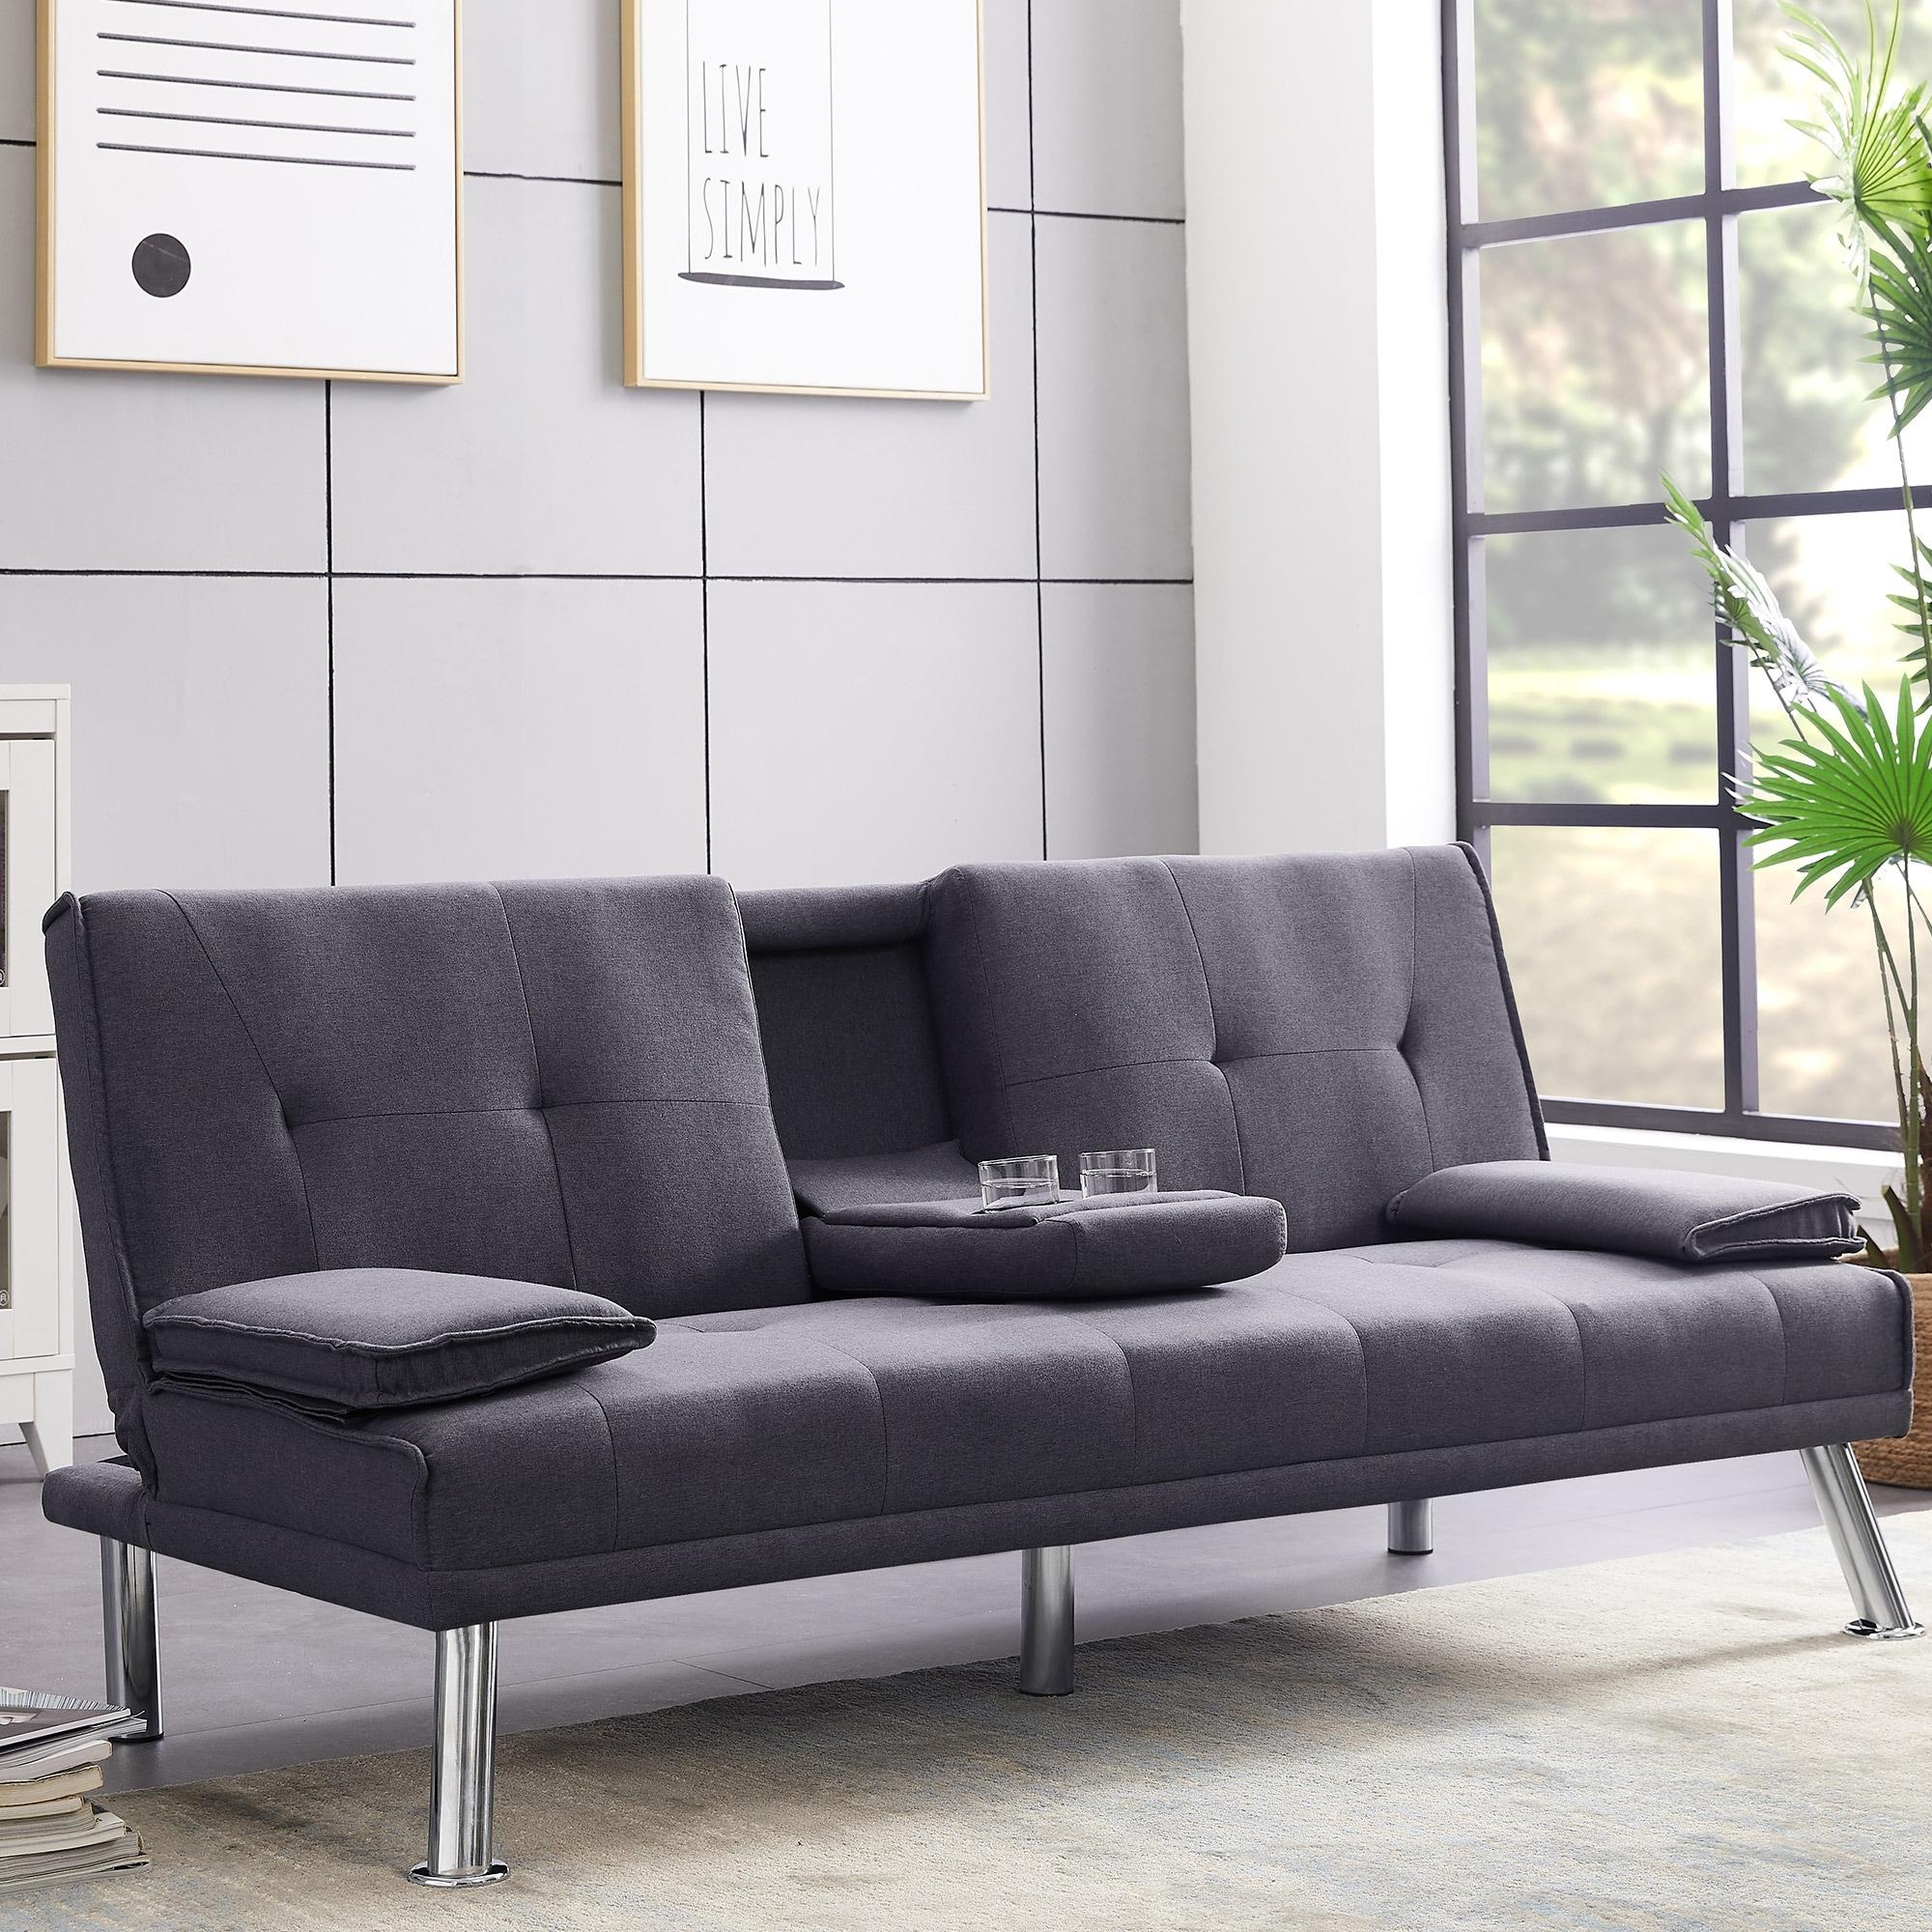 Shop Modern Convertible Futon Sofa Overstock 31989583